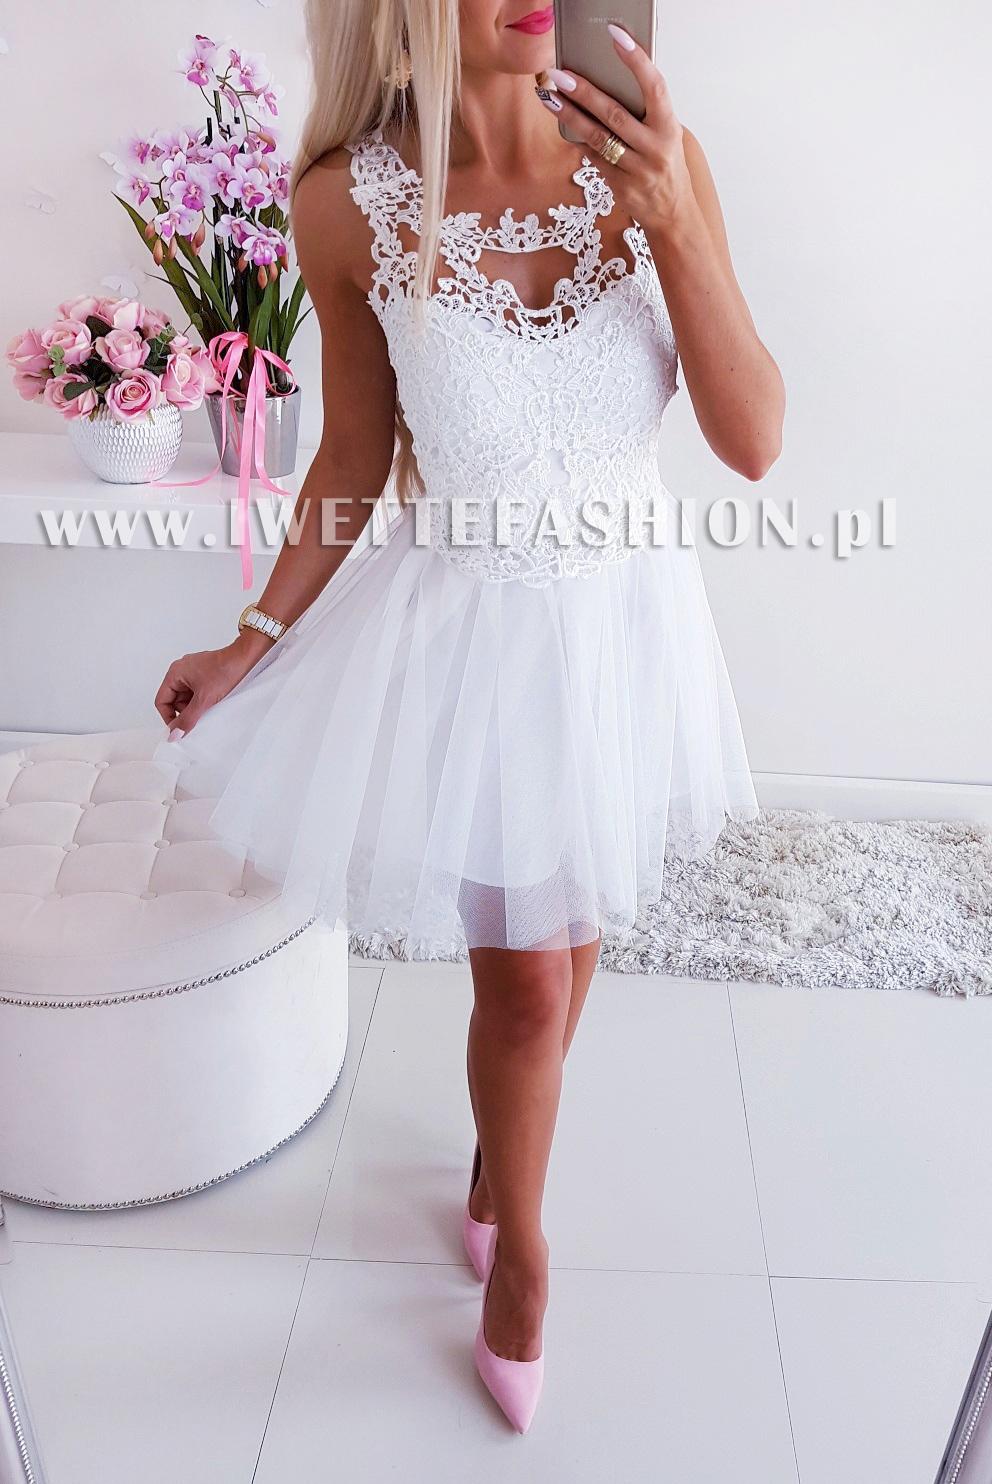 ПлатьеSussan White